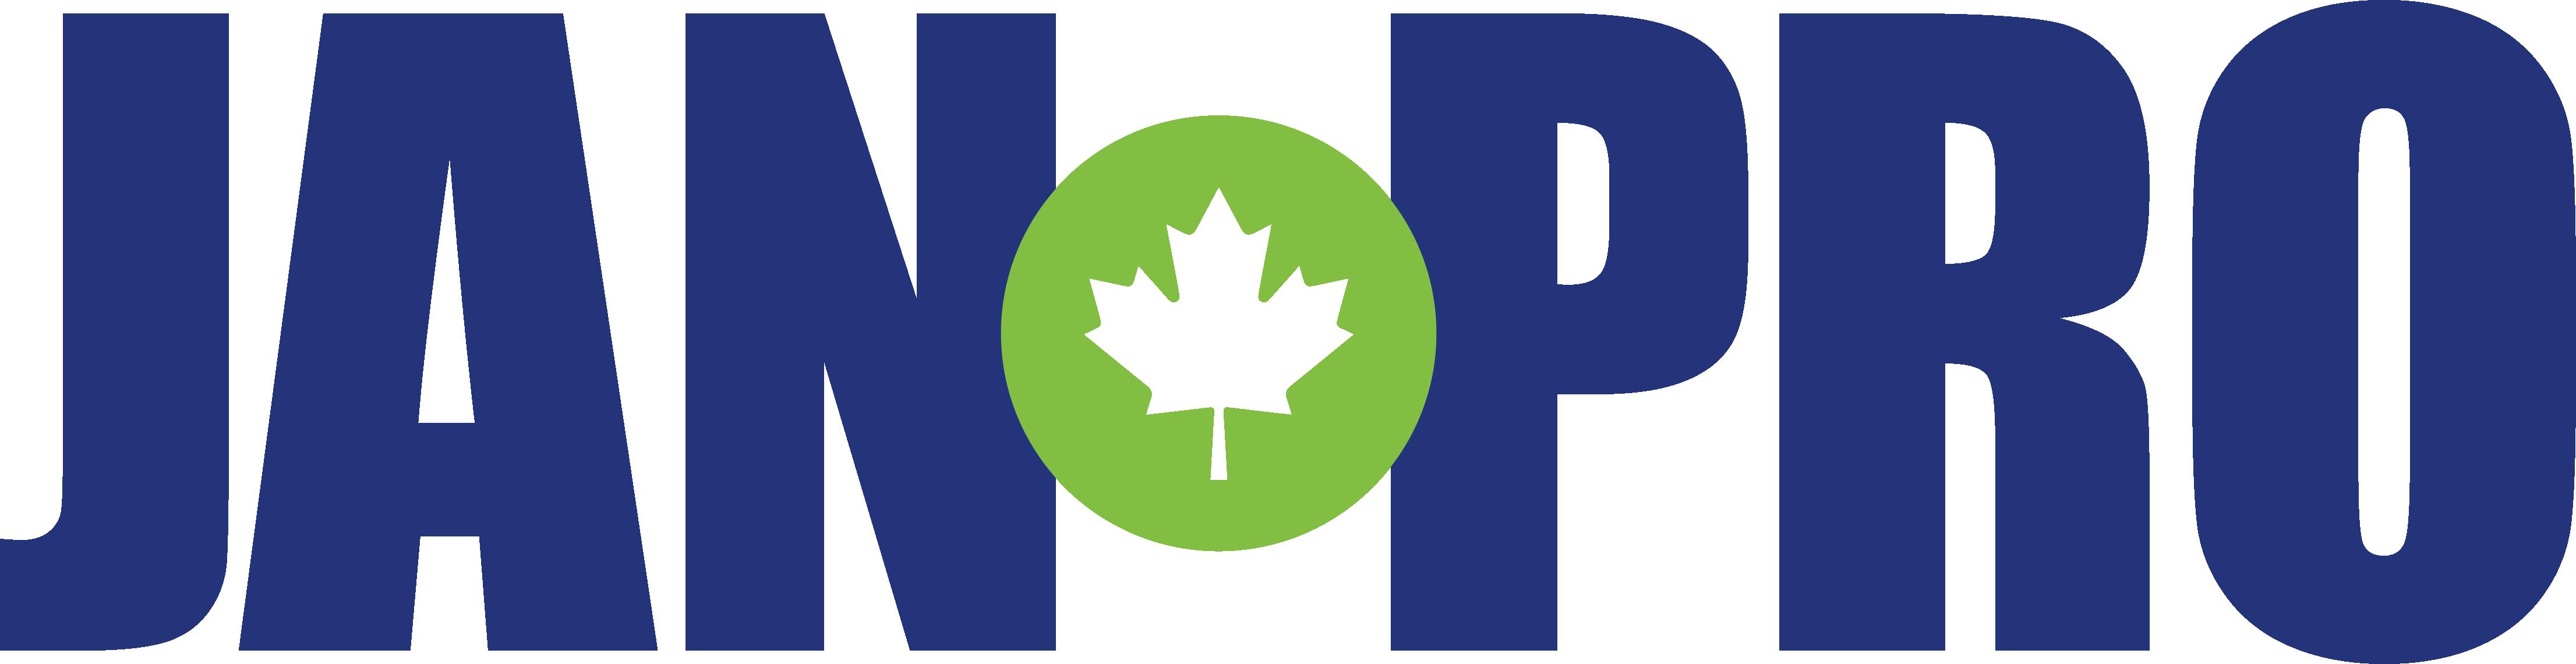 new_logo_jan-pro_VF.png